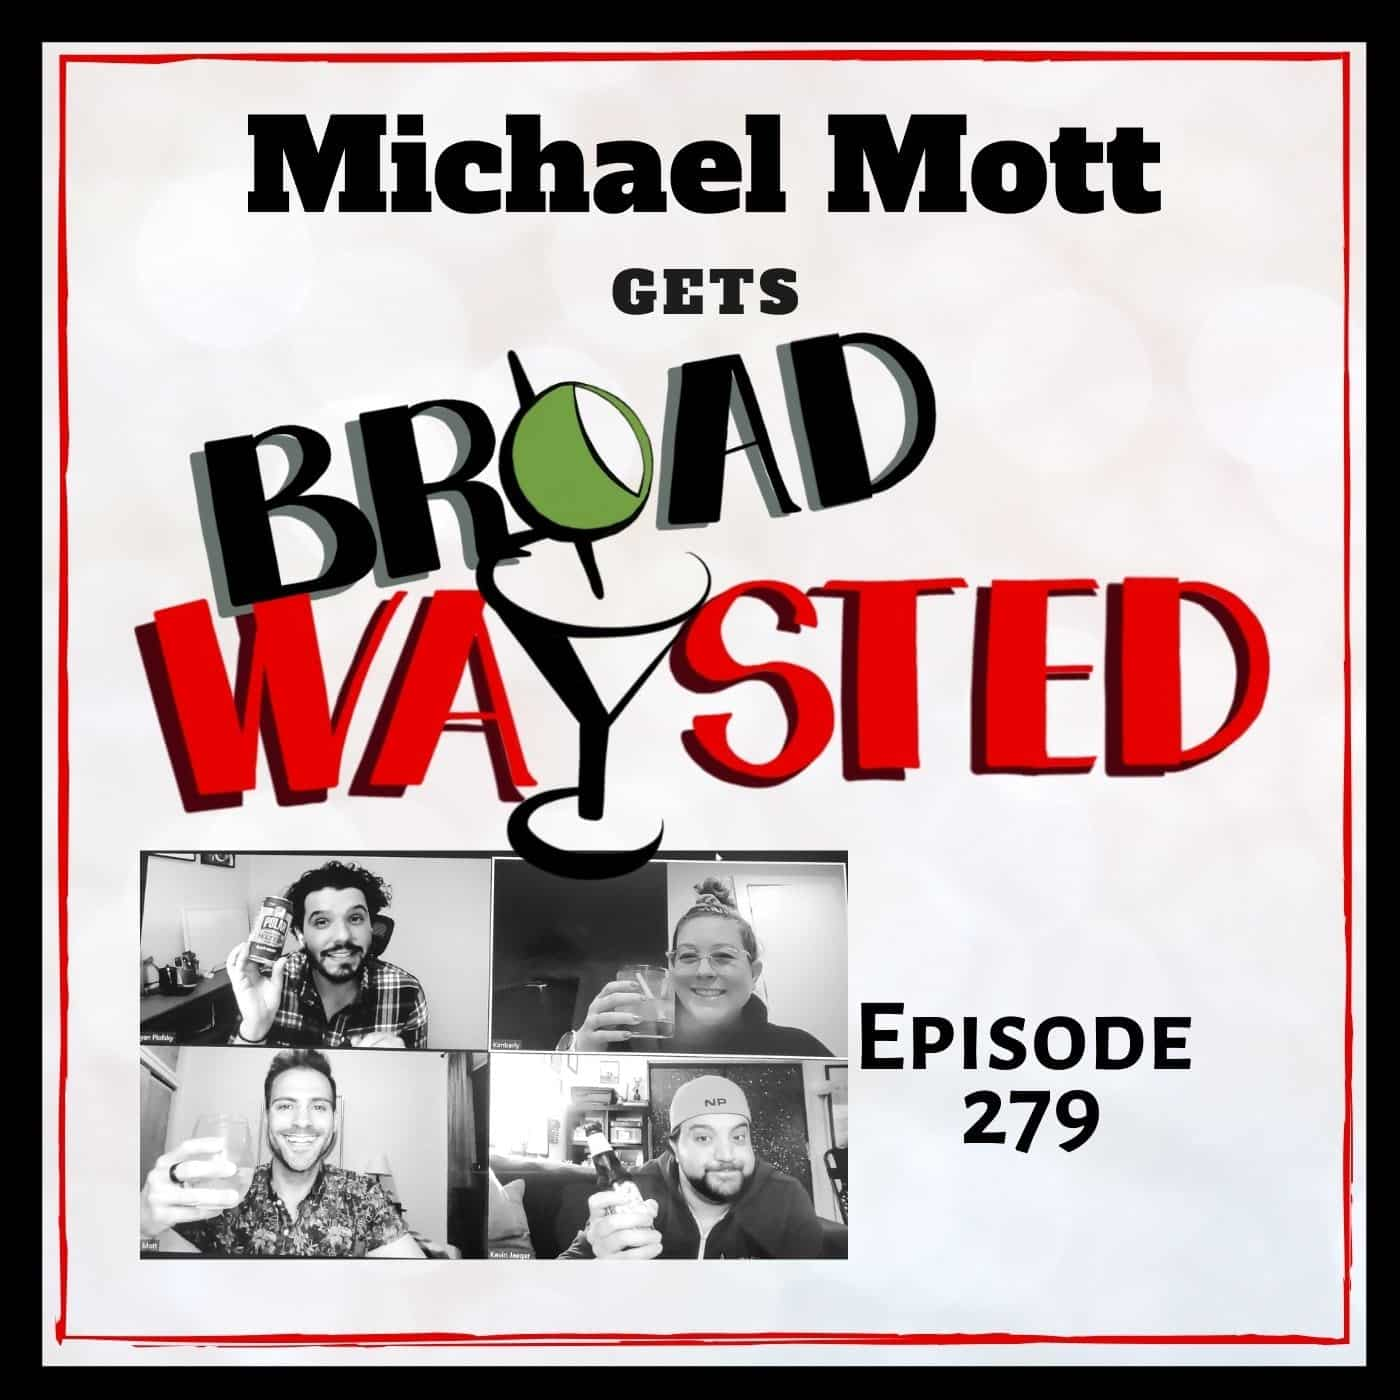 Episode 279: Michael Mott gets Broadwaysted, again!